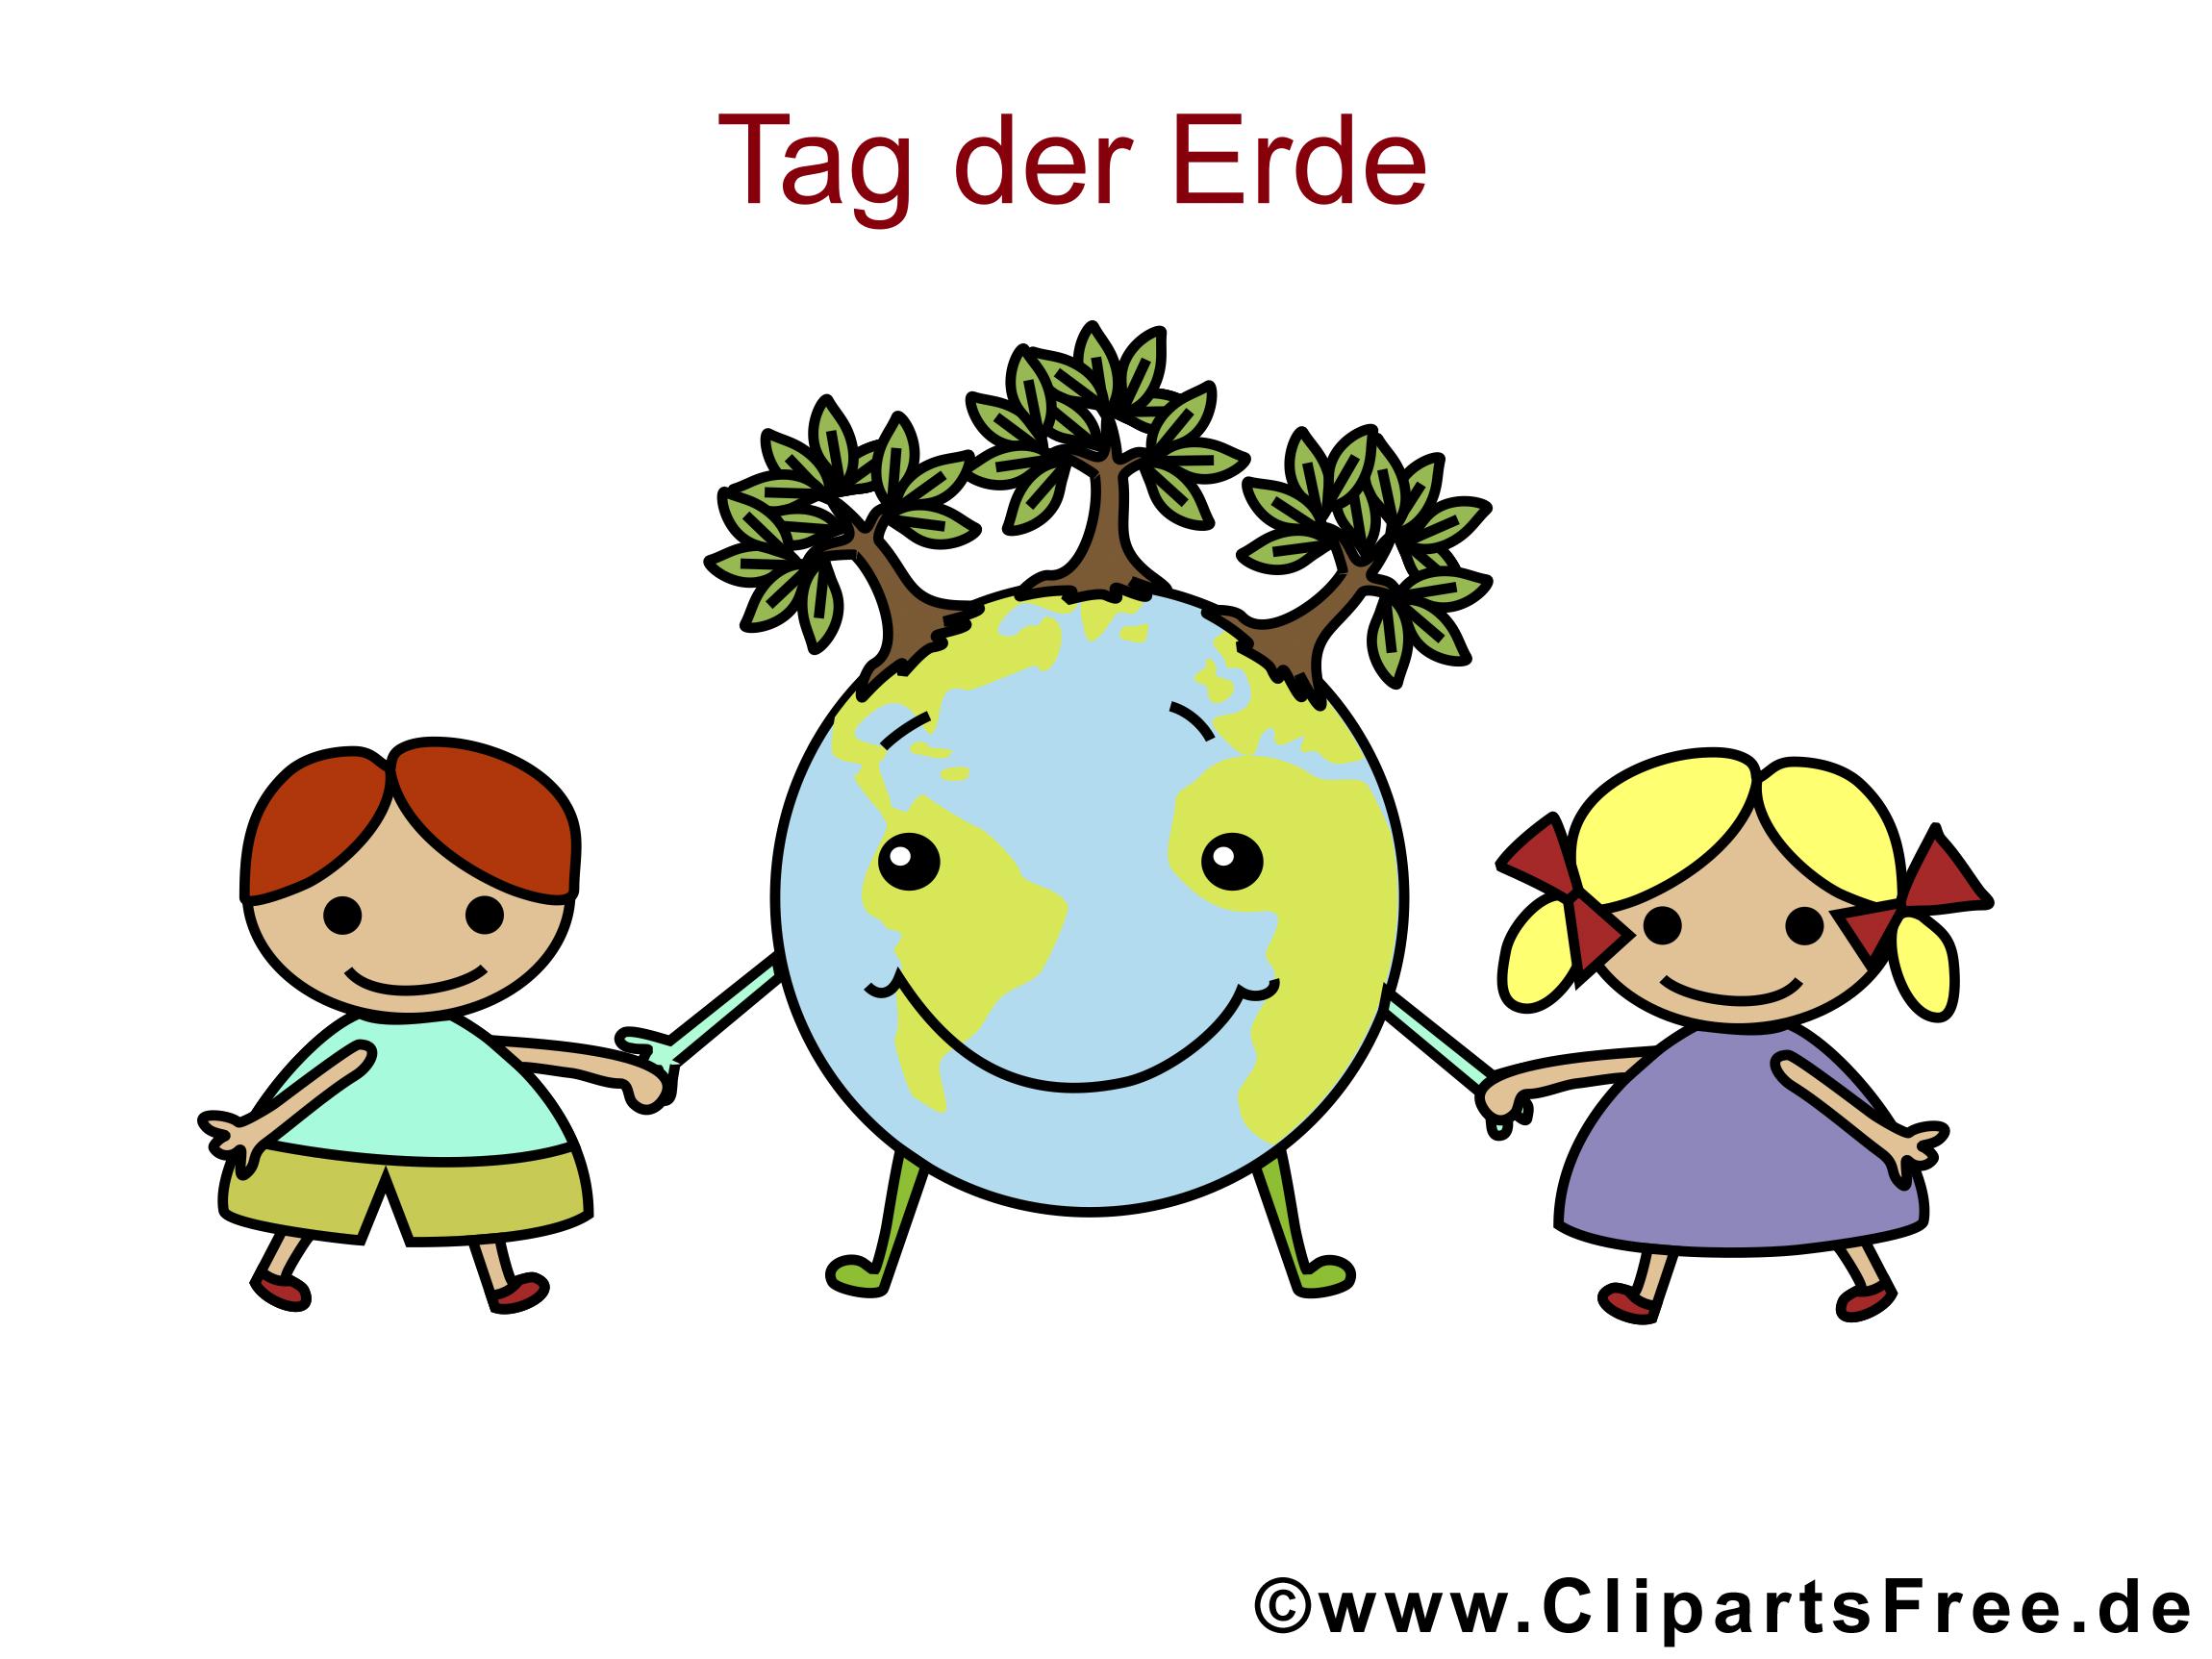 E Card zum Tag der Erde